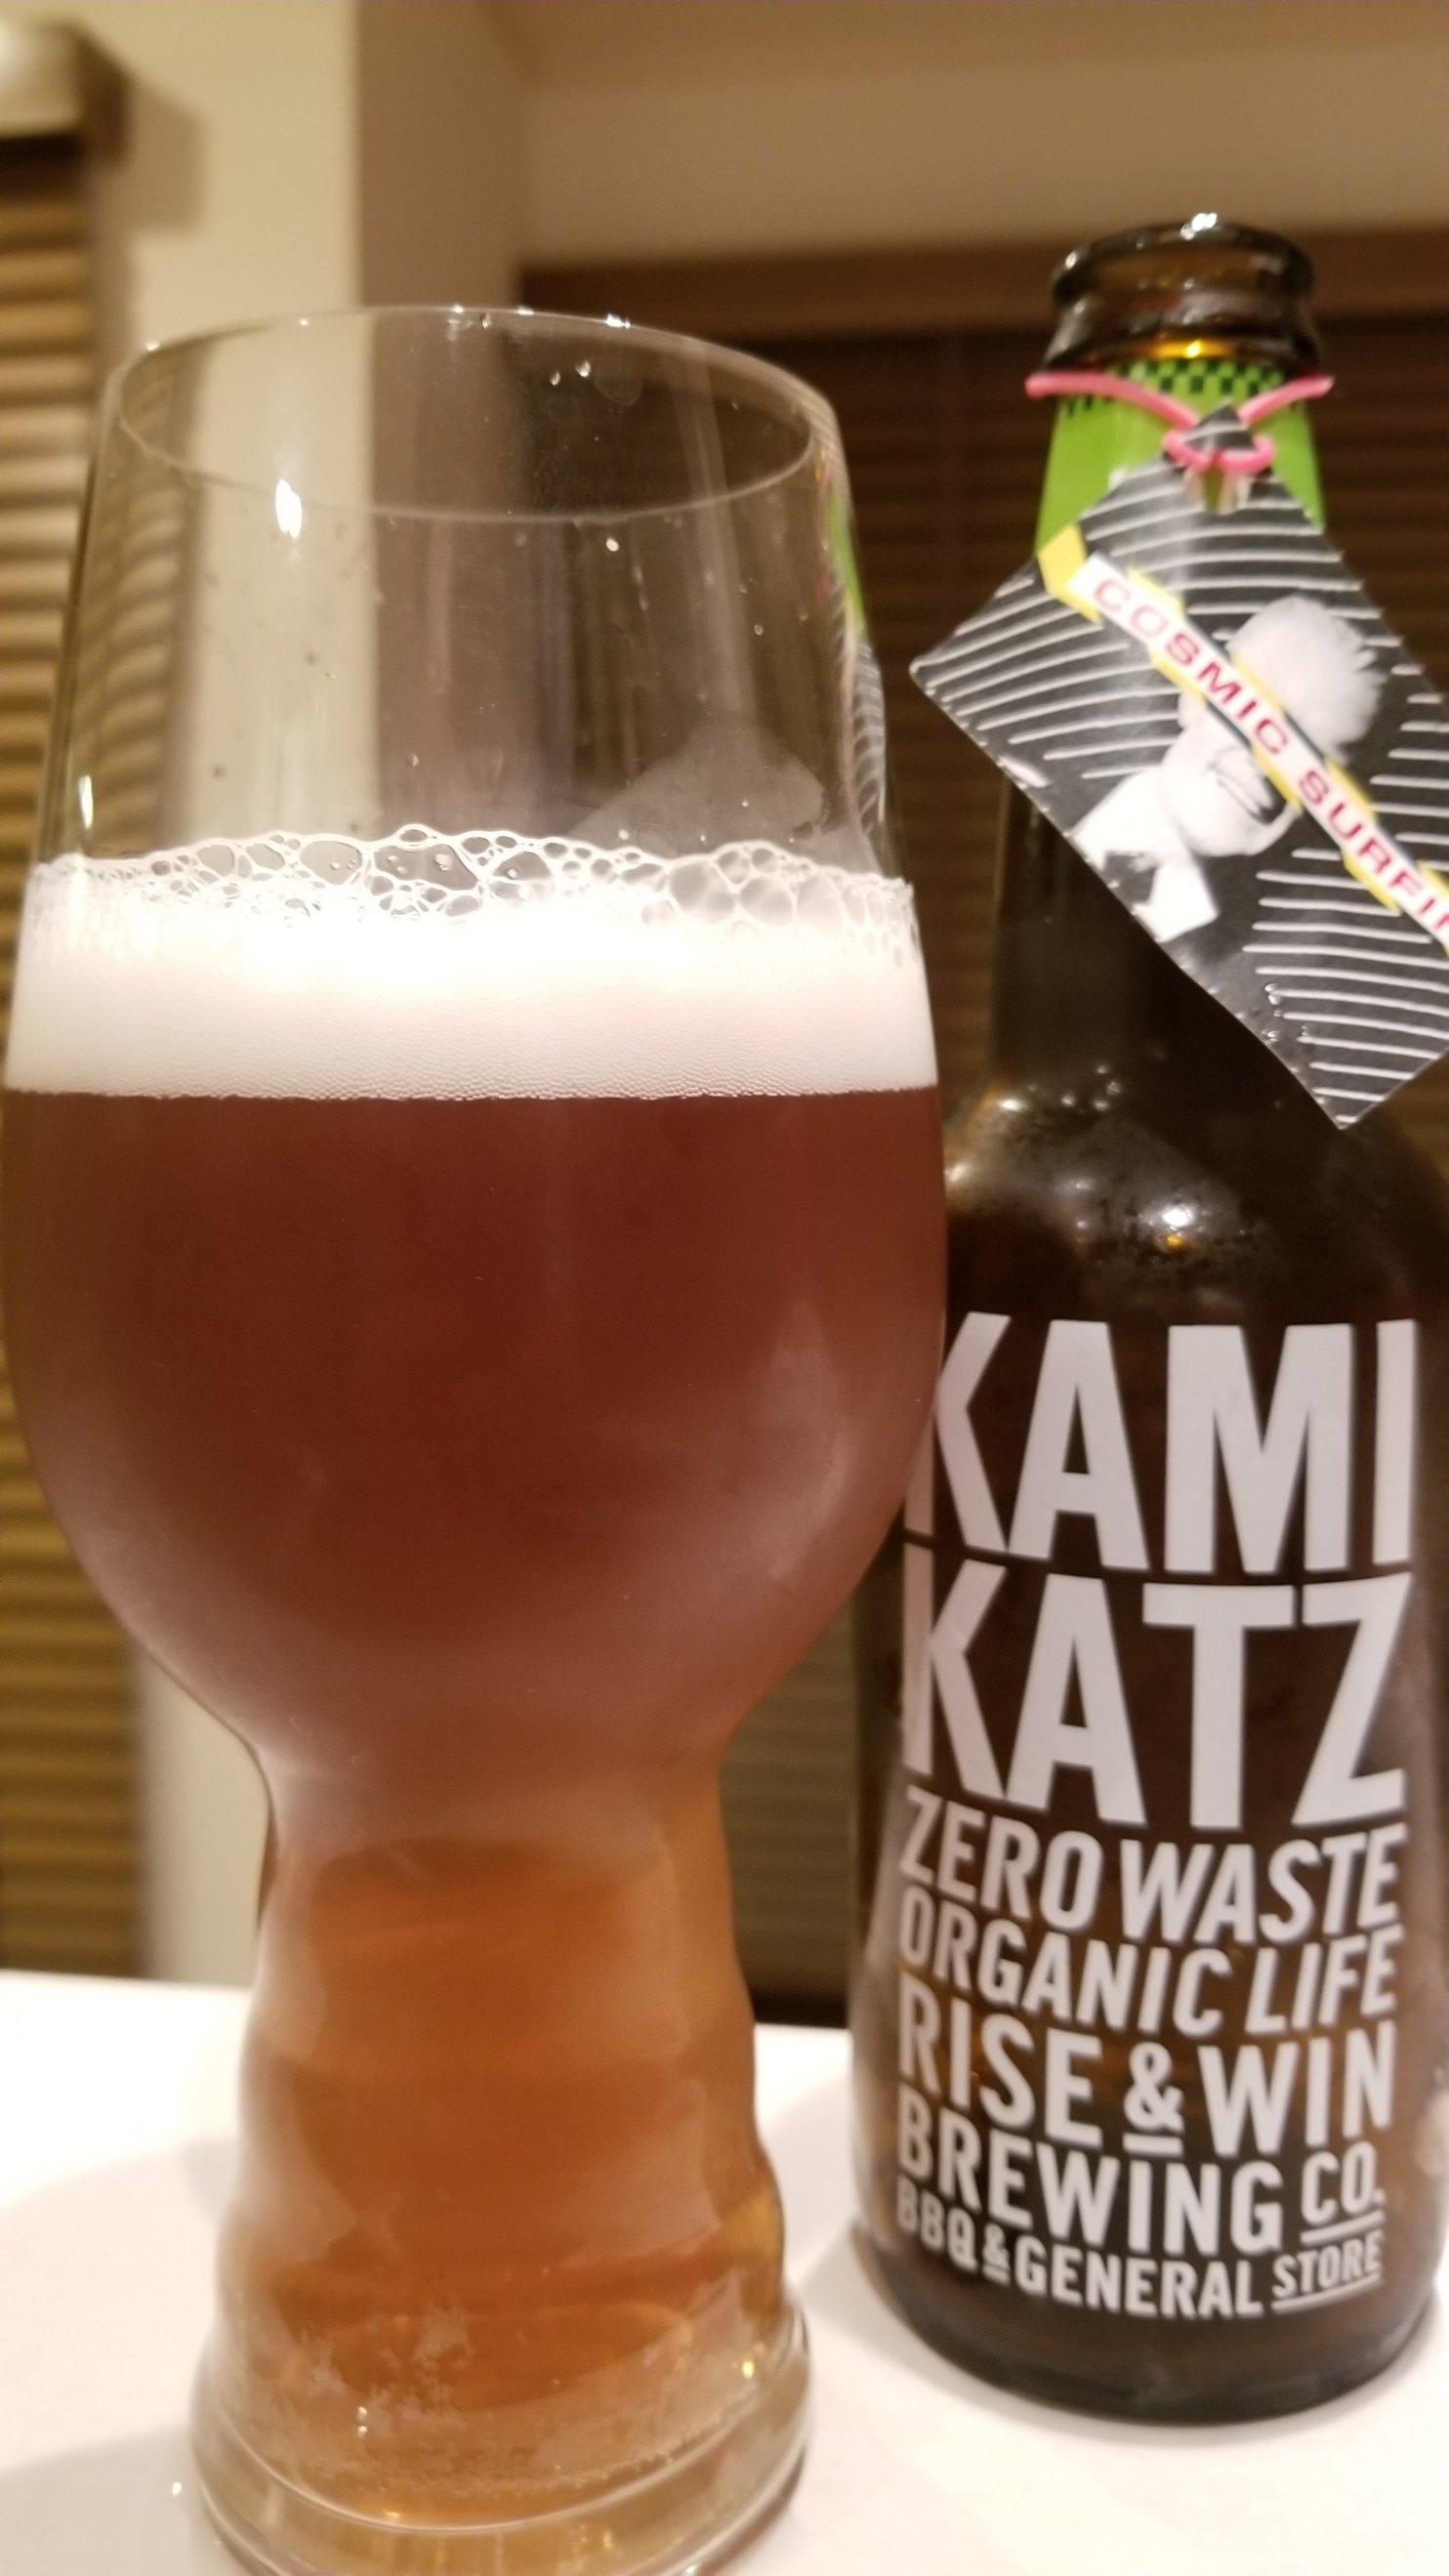 Kamikatz Cosmic Surfin カミカツコスミックサーフィン